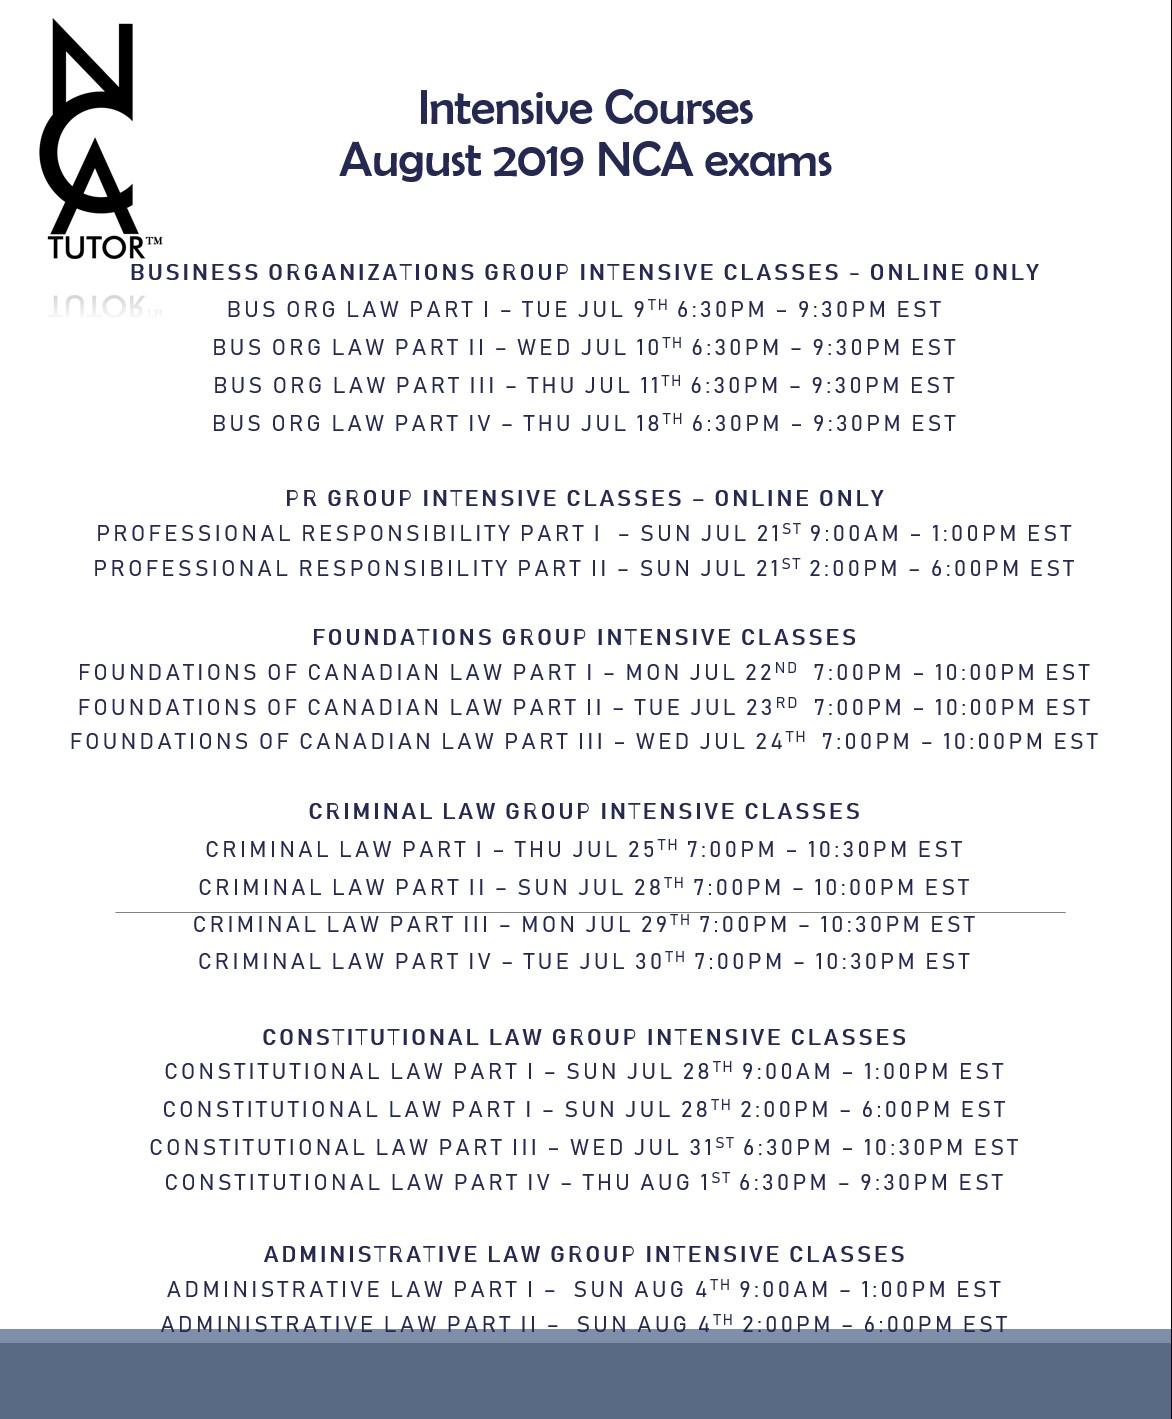 August 2019 NCA Exams - Course Schedule - NCA Tutor™